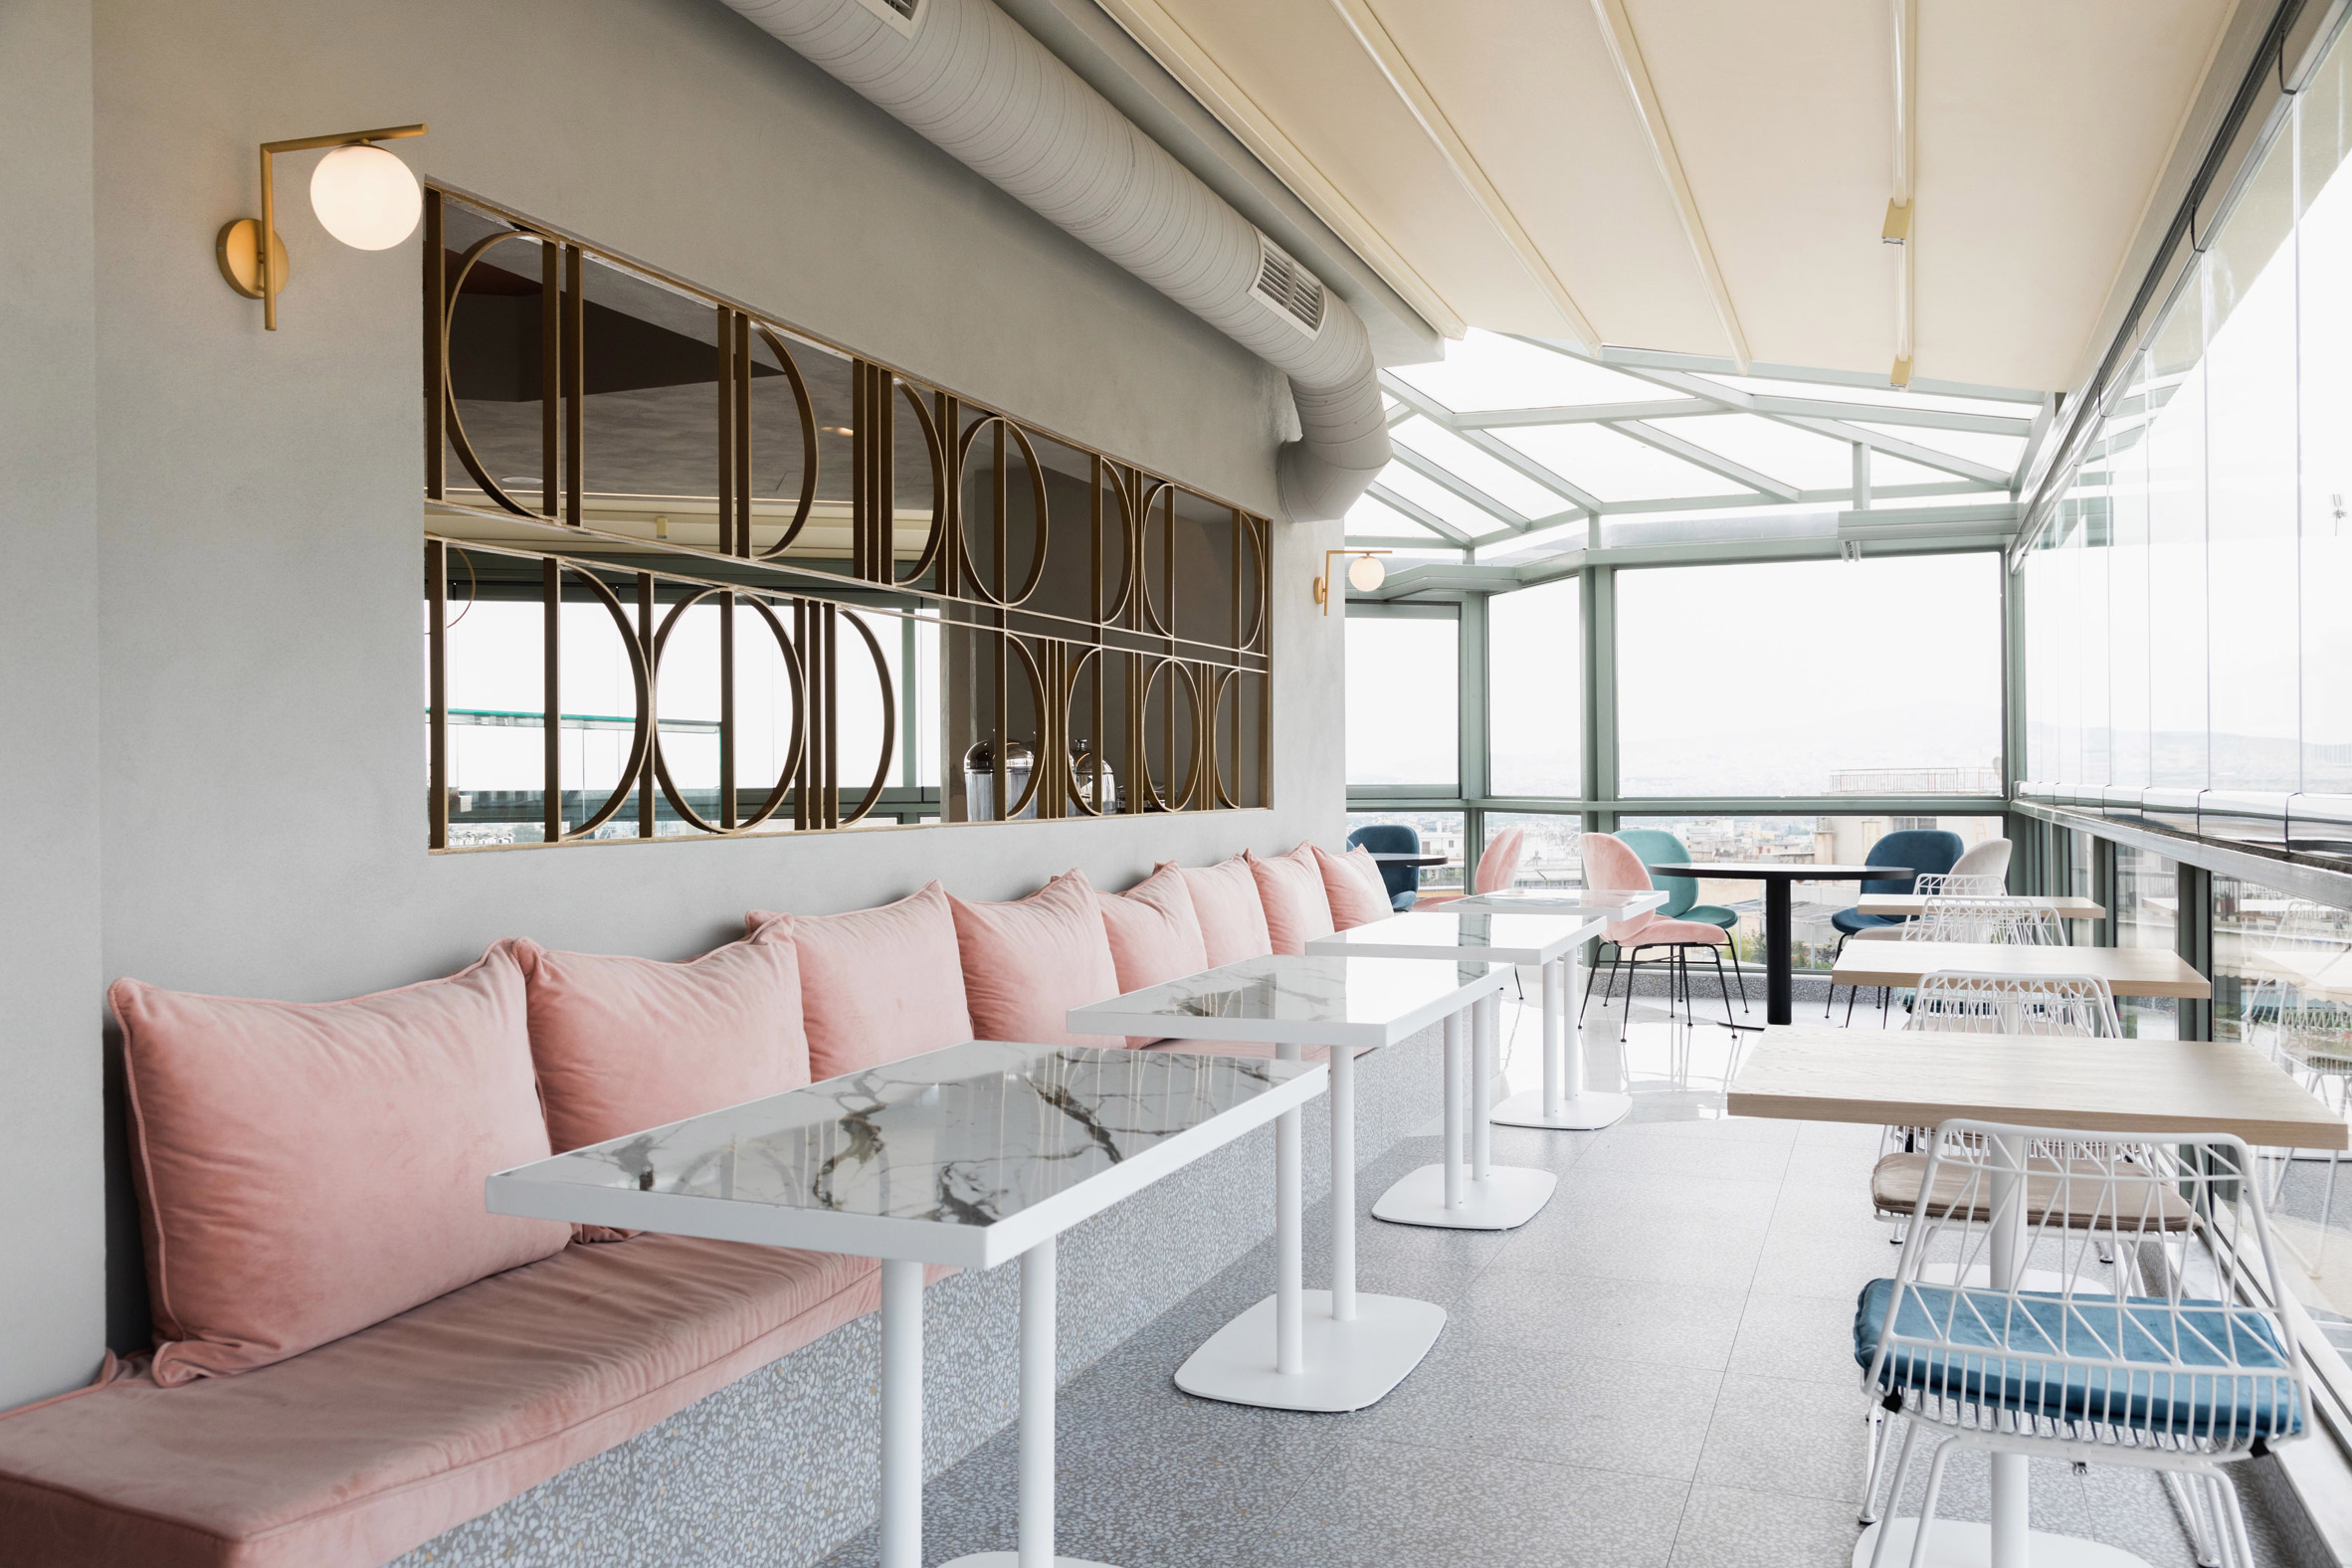 evripidis-hotel-restaurant-christina-serrou-interiors-greece_dezeen_2364_col_3.jpg